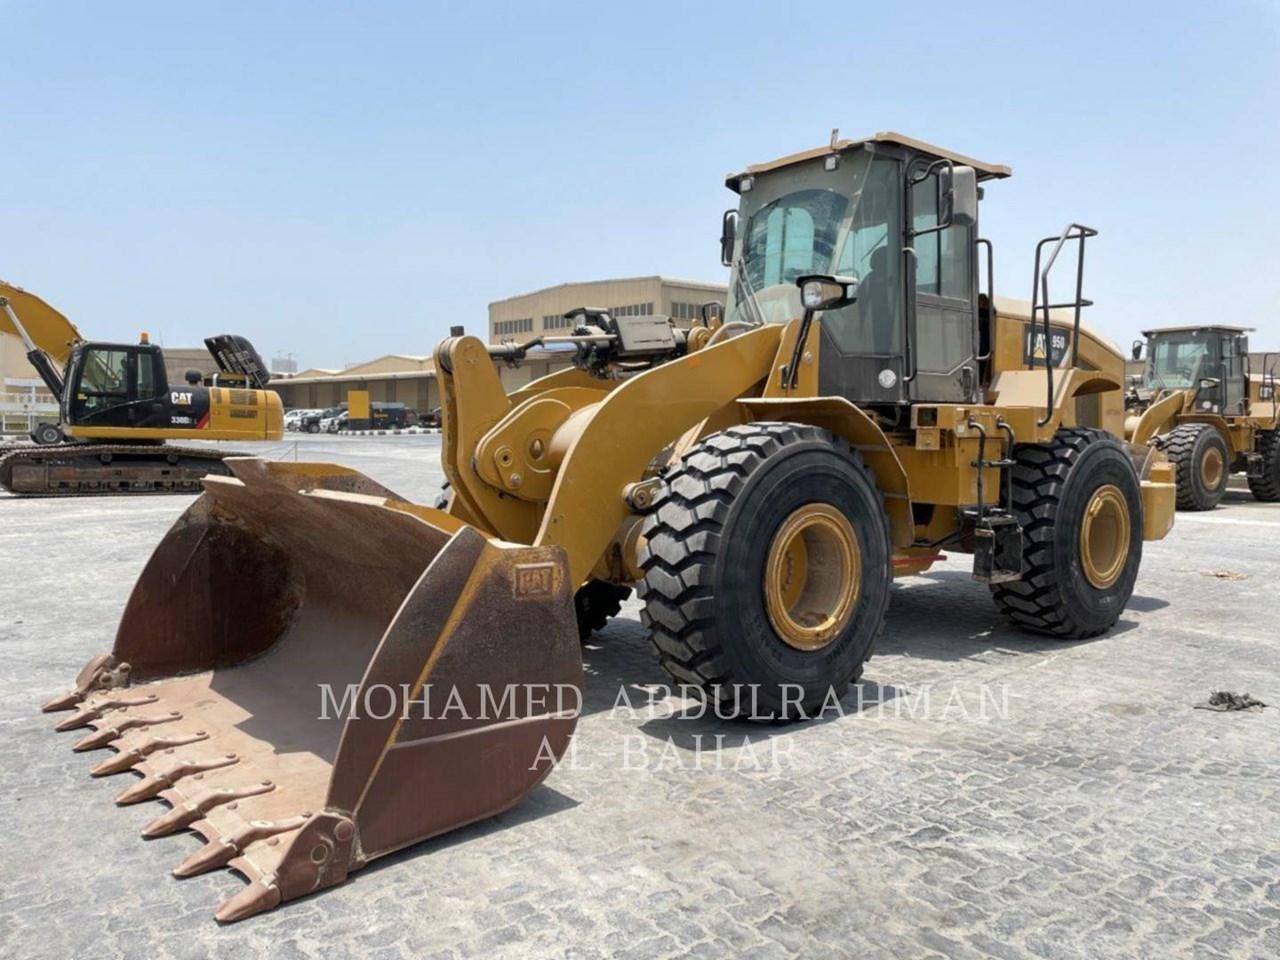 2018 Caterpillar 950 G C Image 1